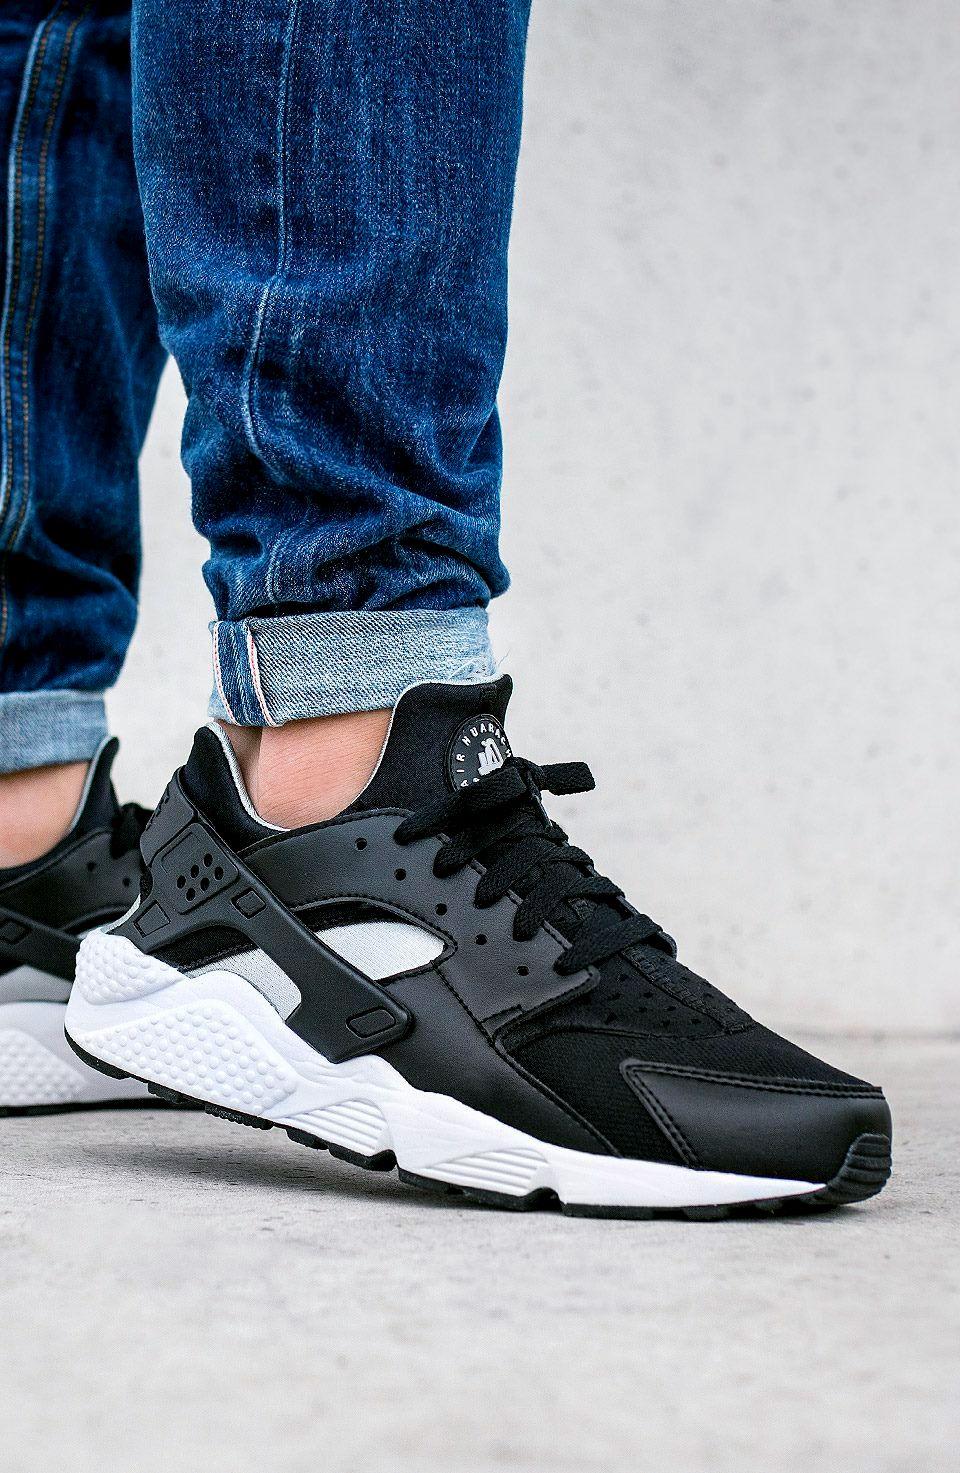 Chaussures Habillées : Asics,Nike,Puma,New Balance,Adidas